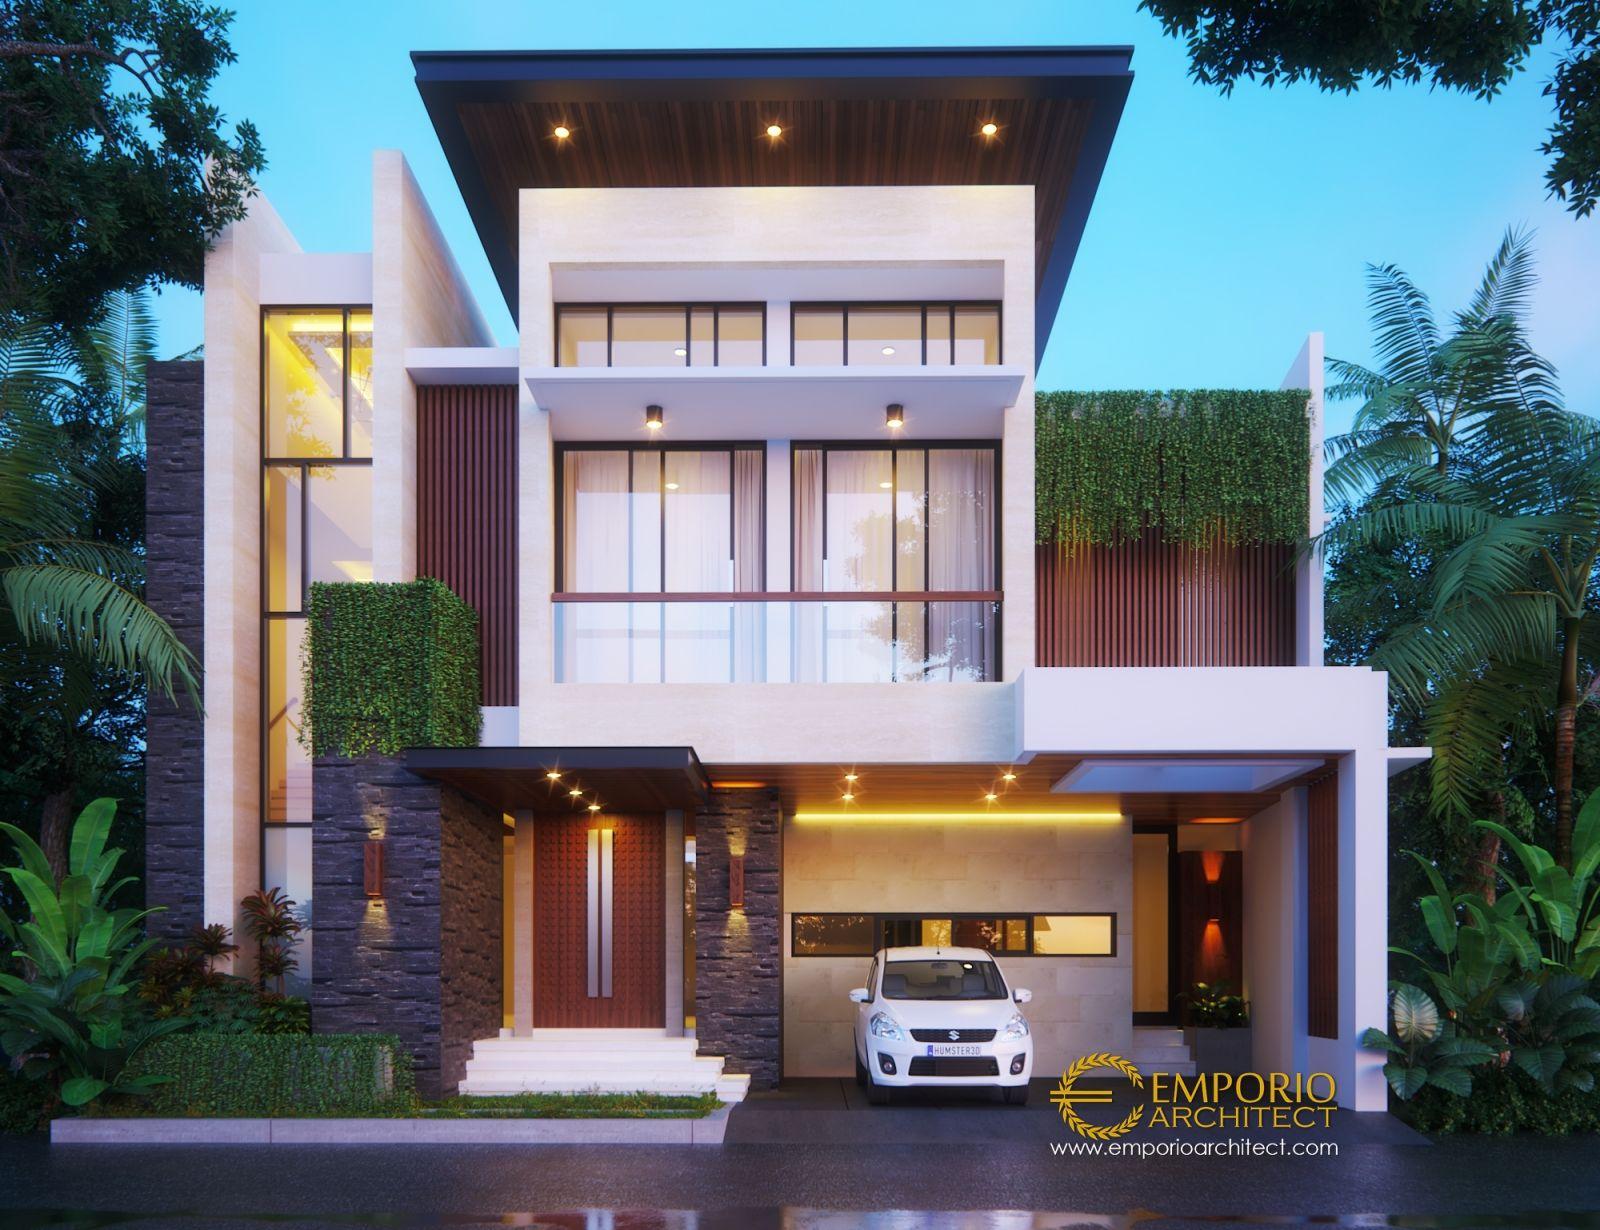 Jasa Arsitek Jatibening Bekasi Desain Rumah Ibu Johana Jasa